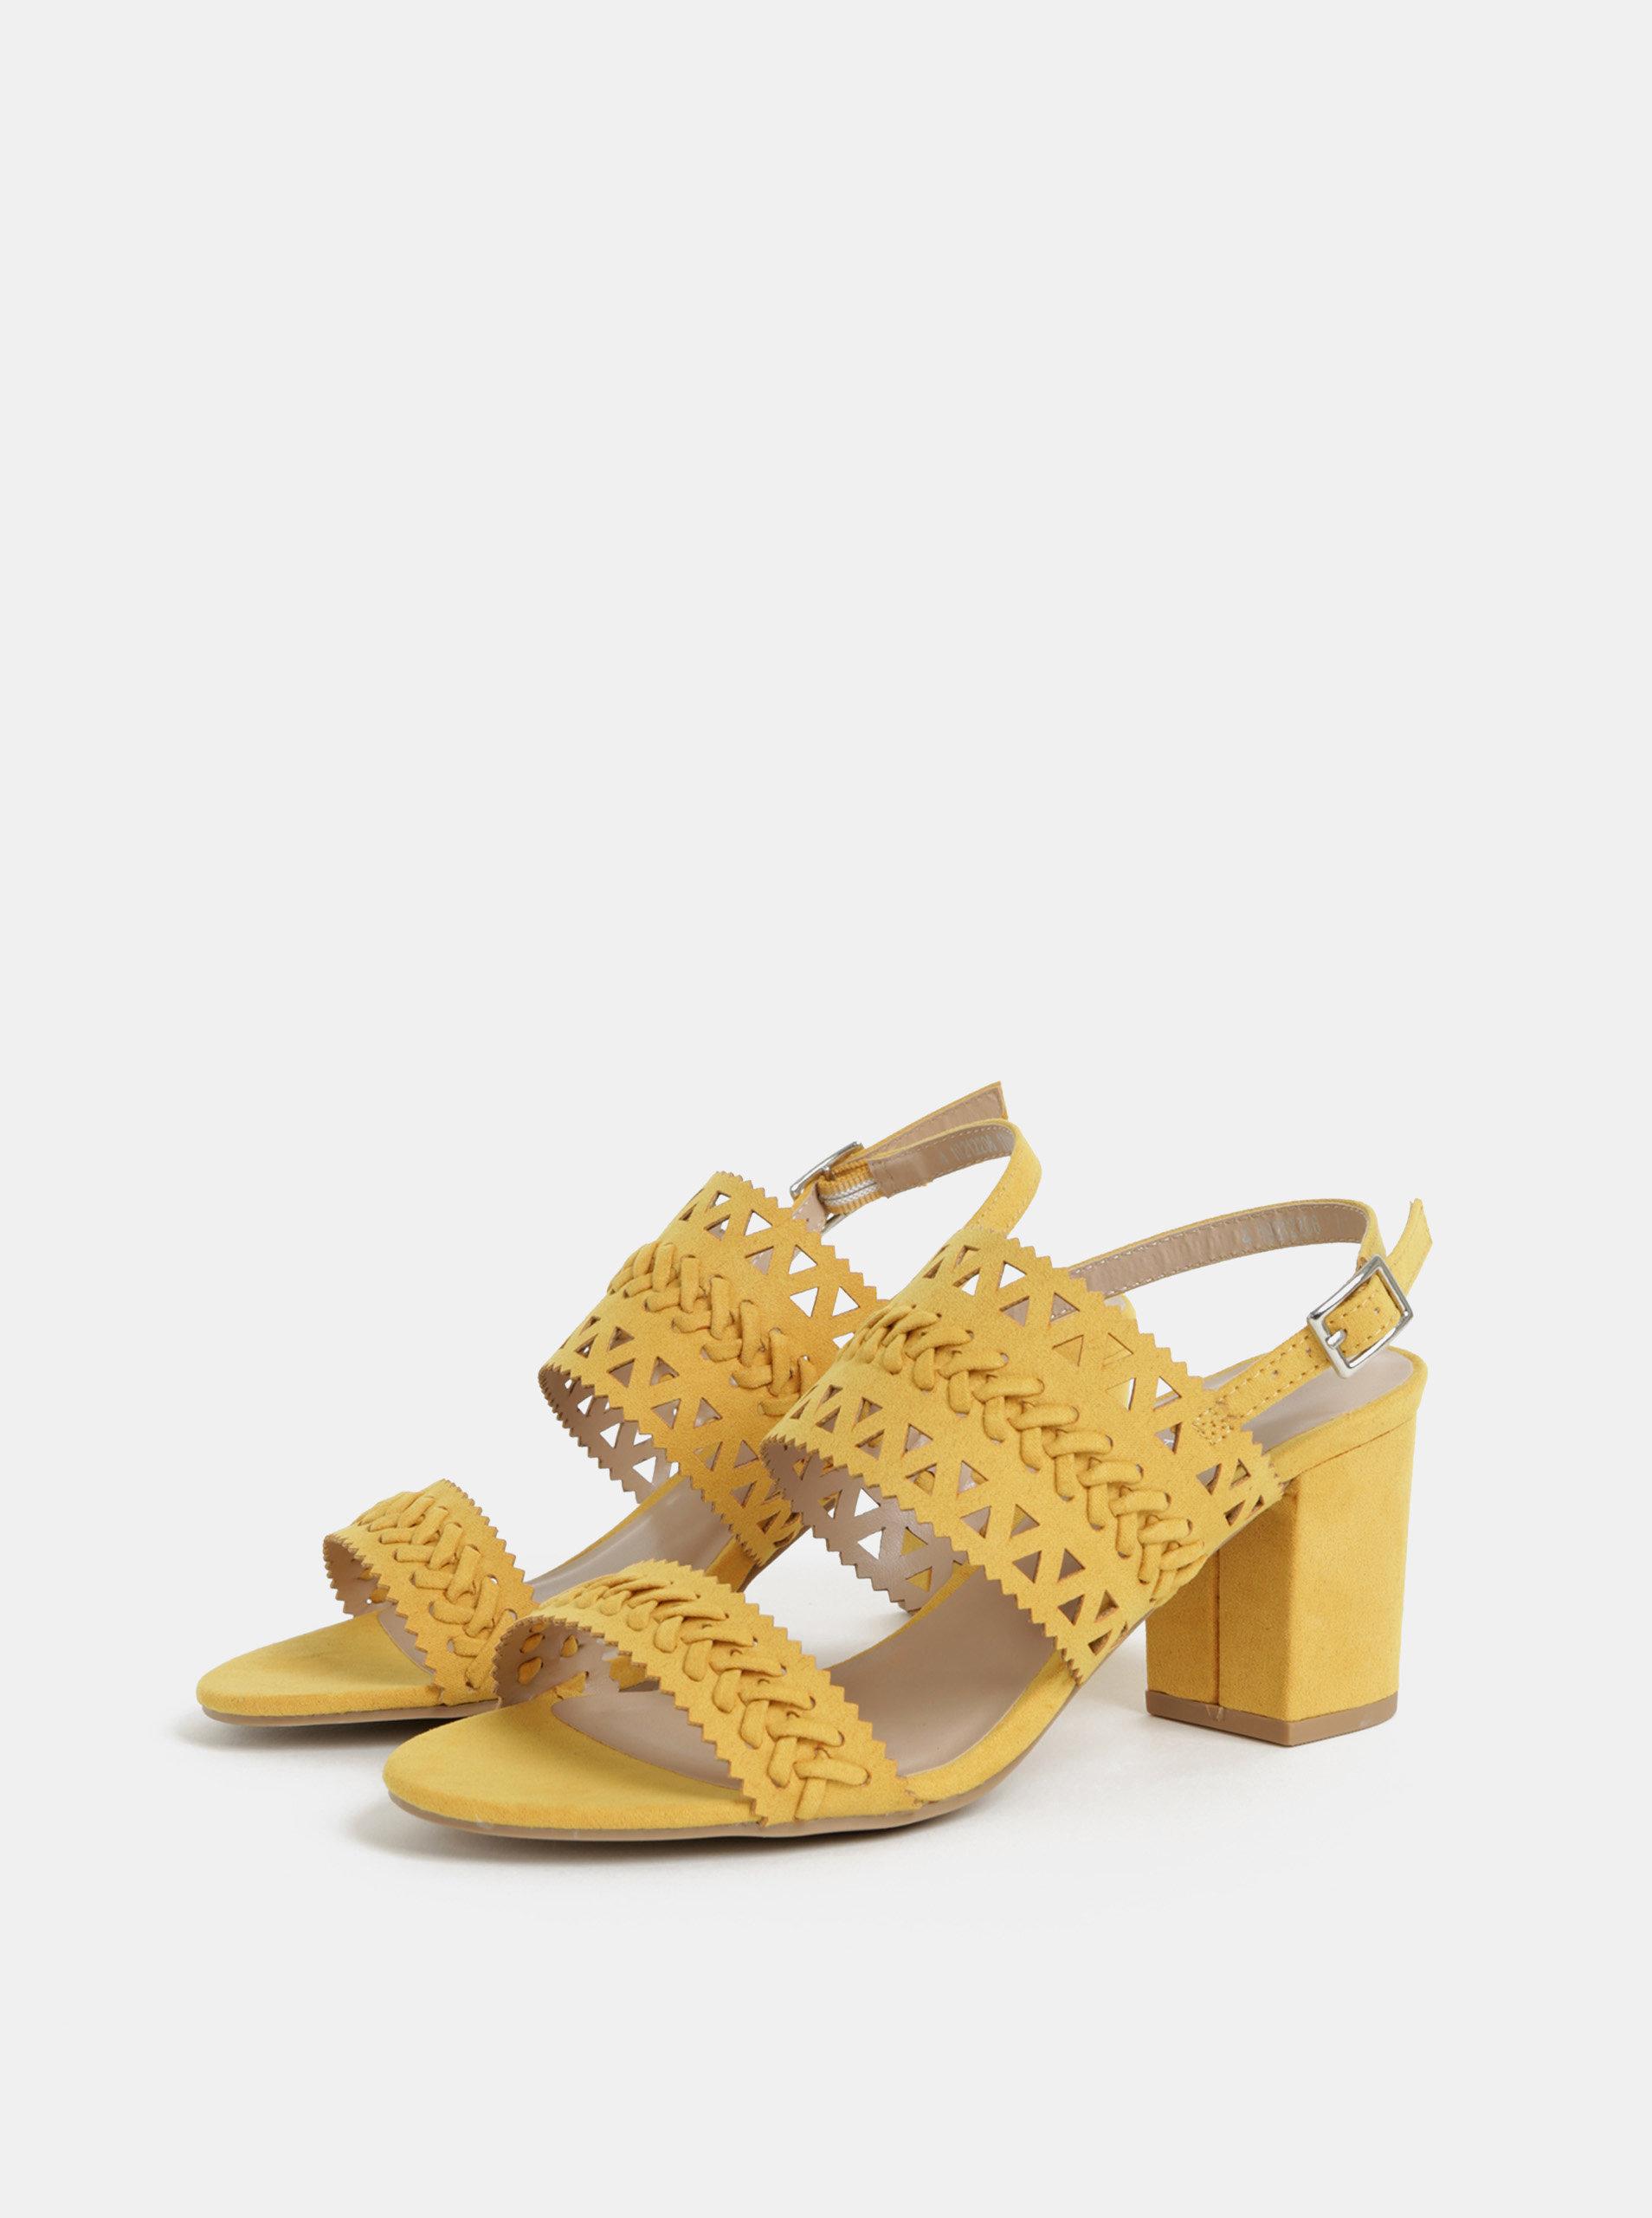 a64a3890706c Žlté sandále v semišovej úprave Dorothy Perkins ...